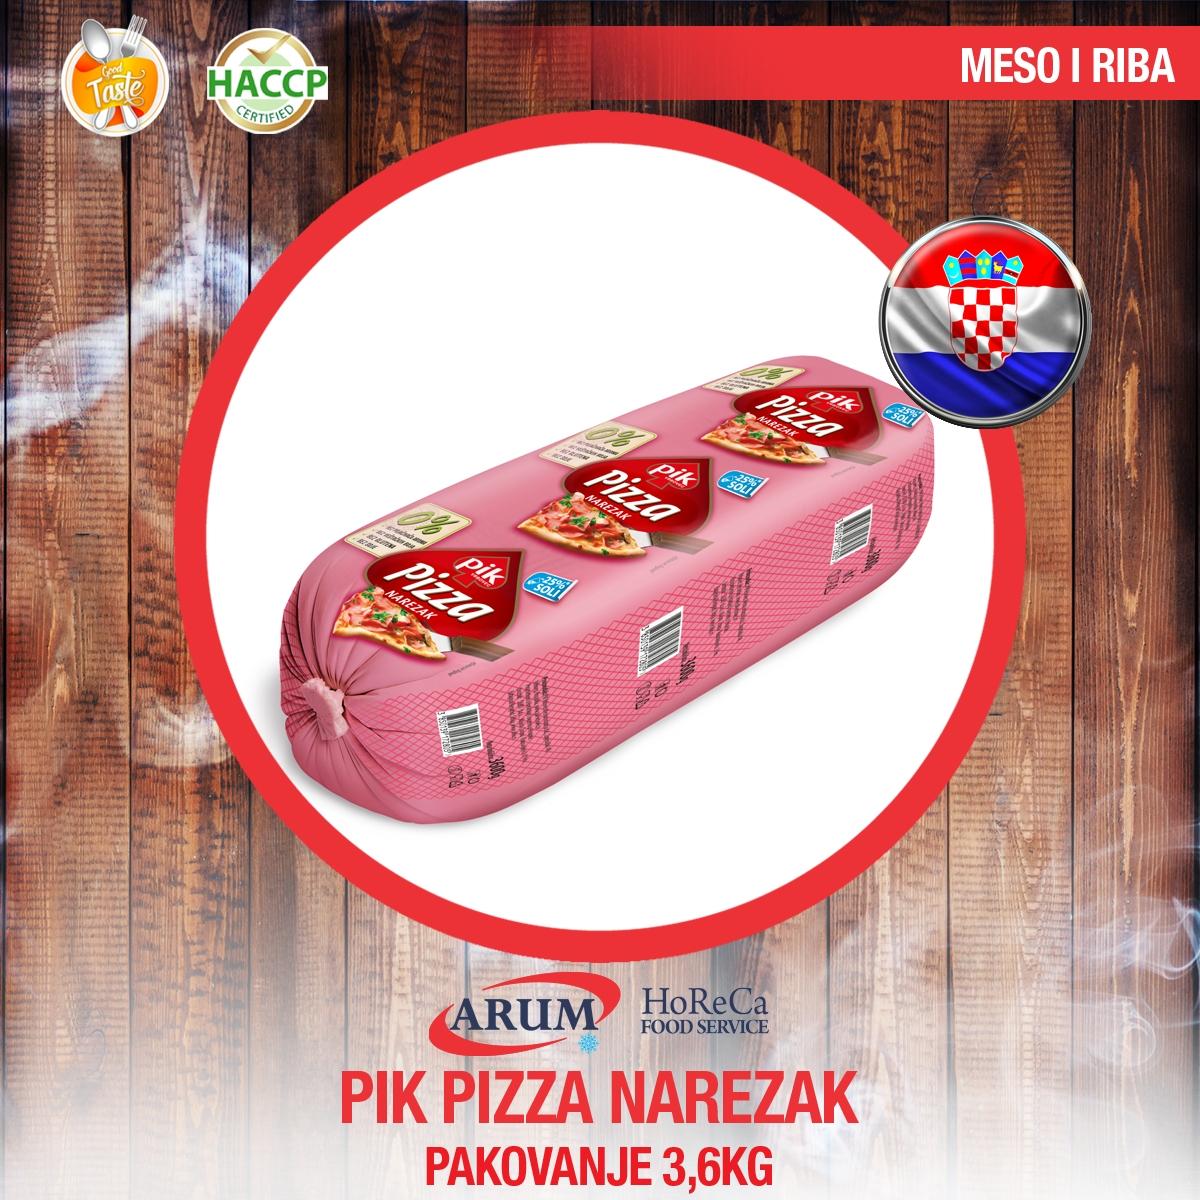 Pik pizza narezak 3,6 kg